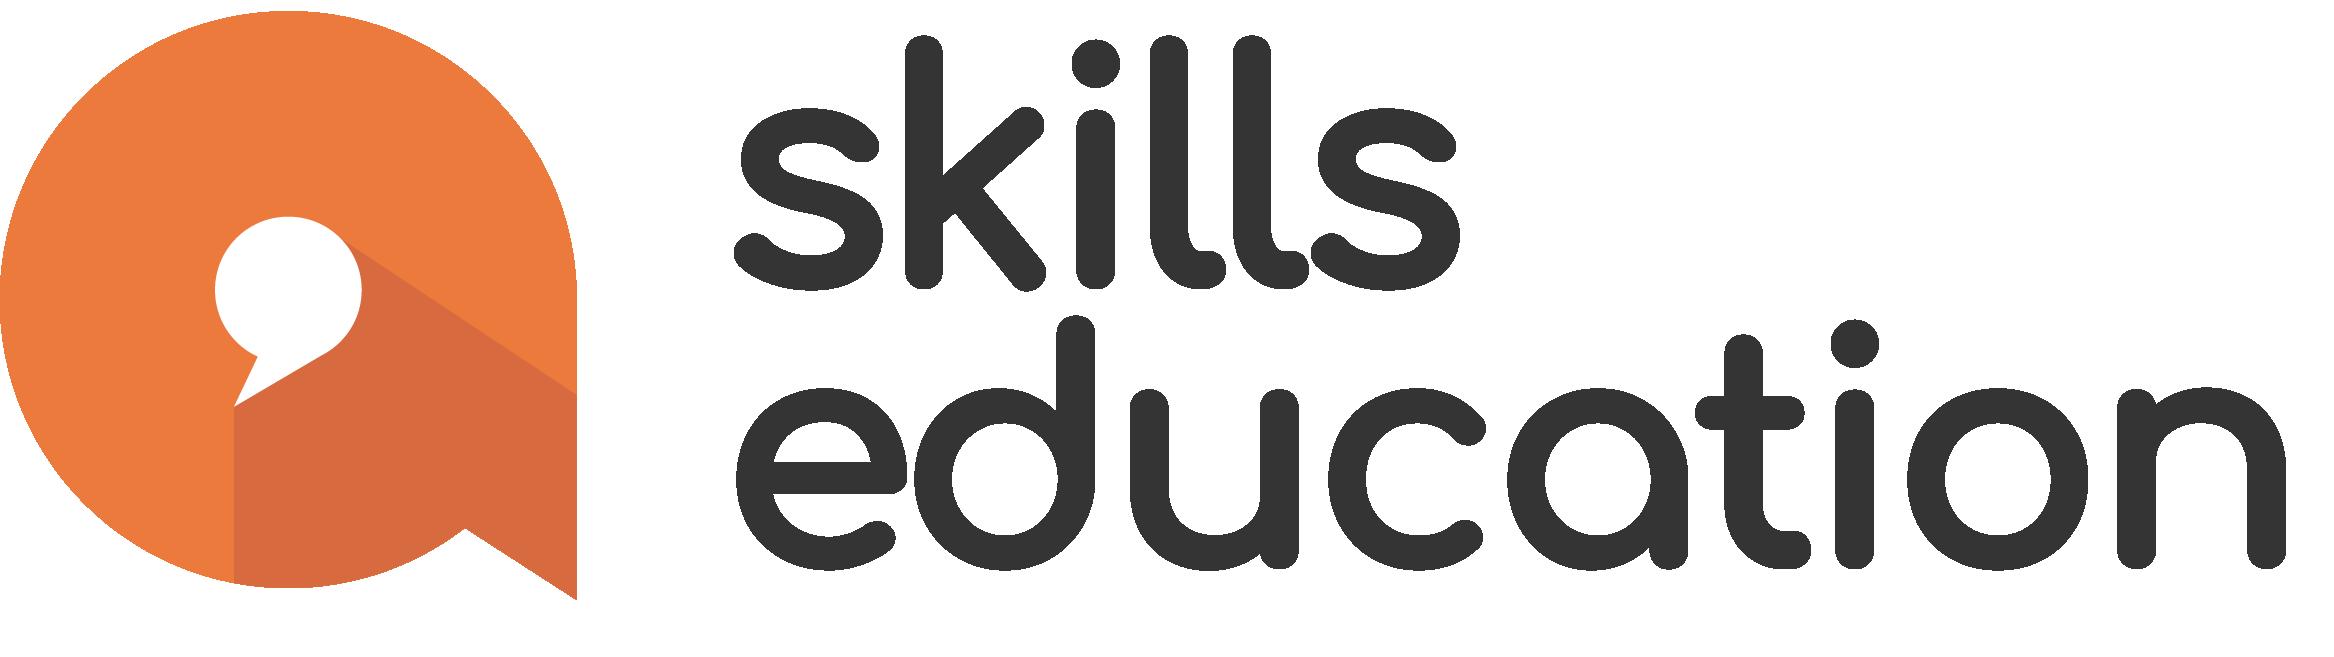 Professional Development Company logo